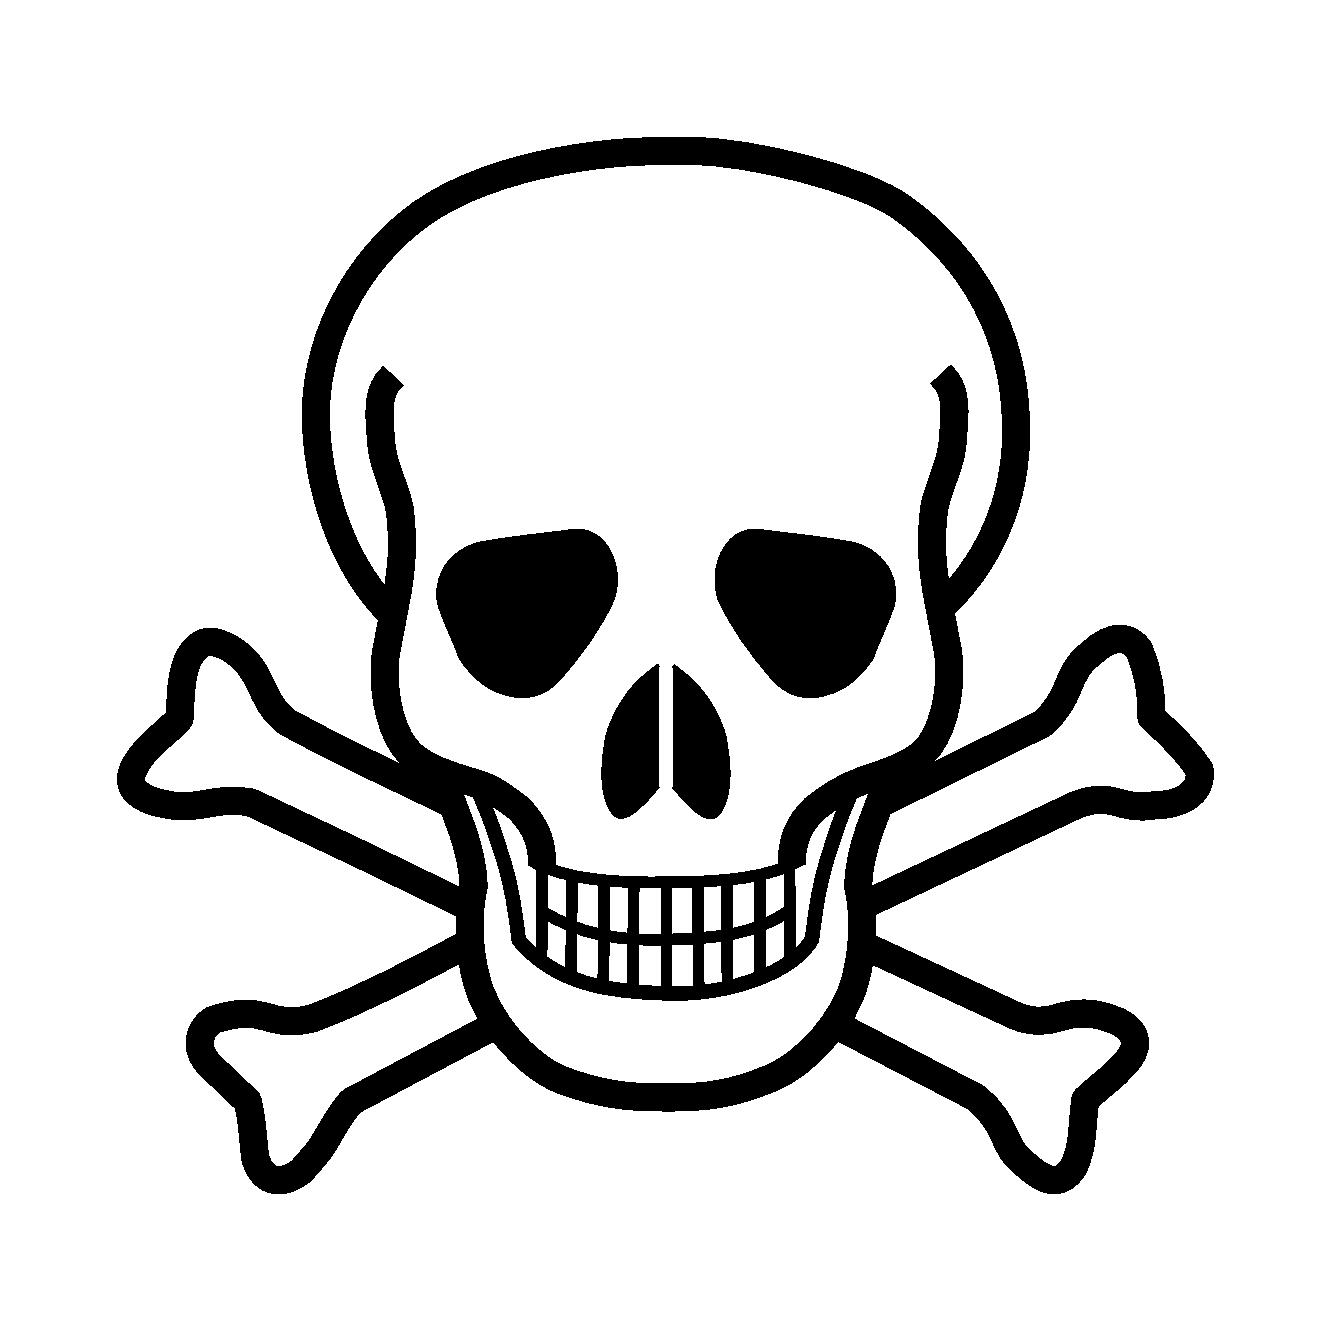 1331x1331 Black And White Skull And Crossbones Clip Art